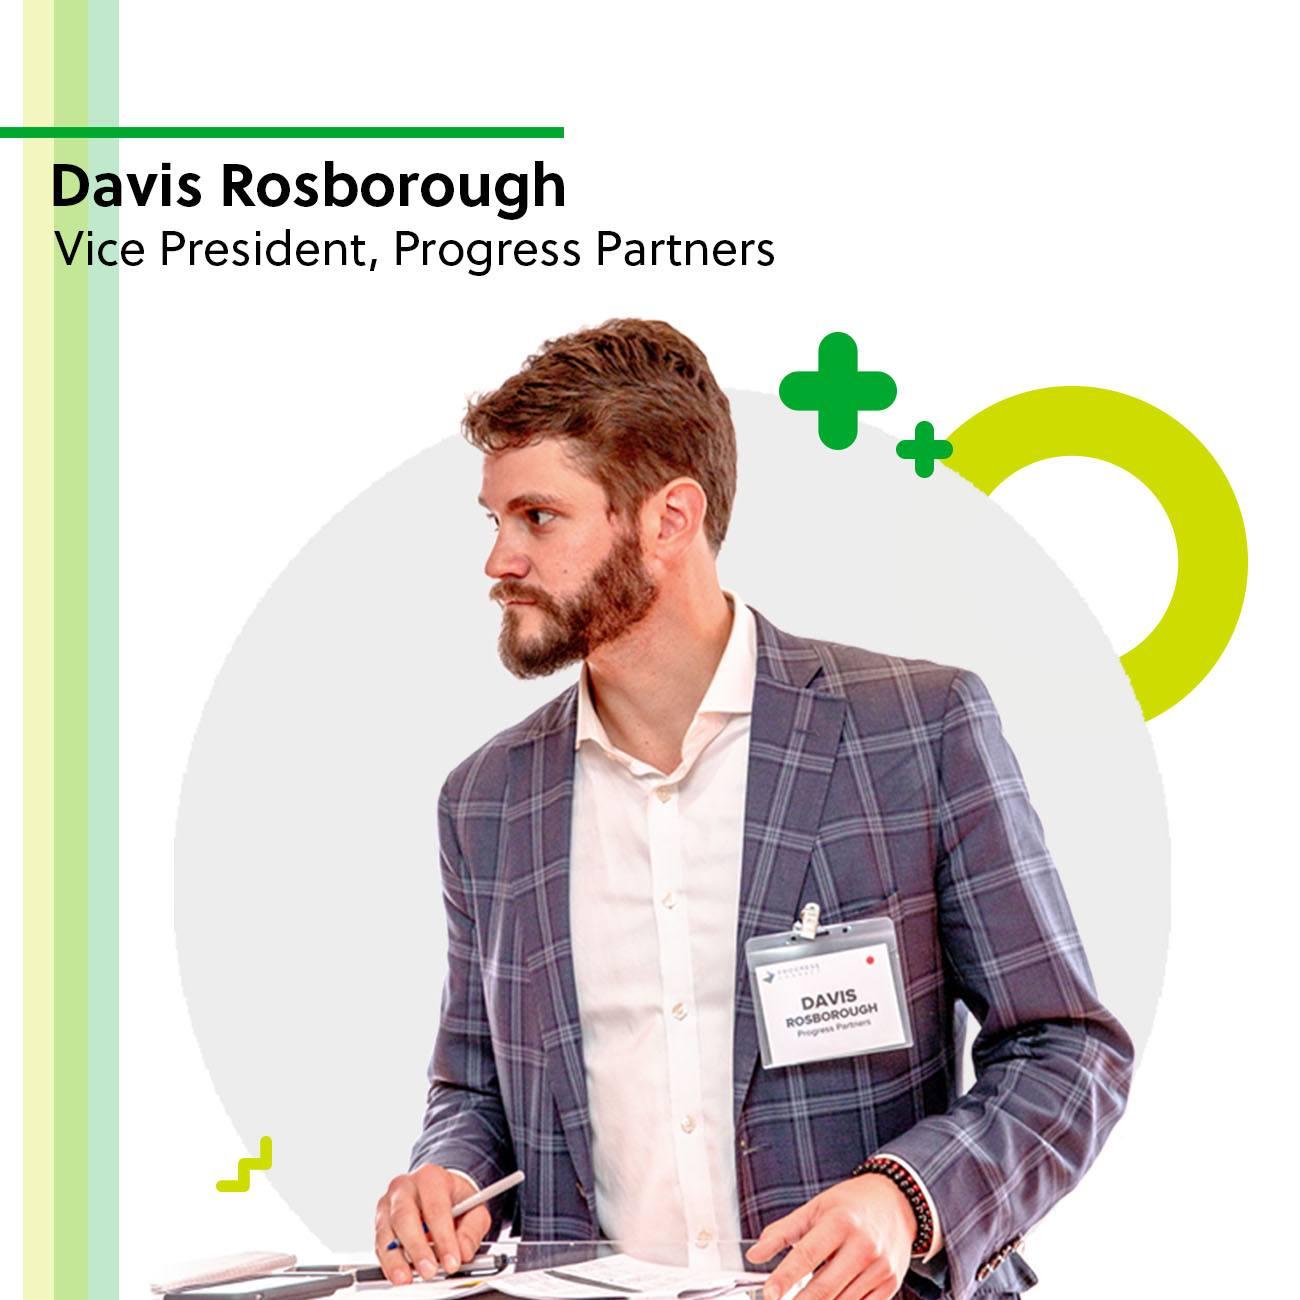 Davis Rosborough, Vice President of Progress Partners